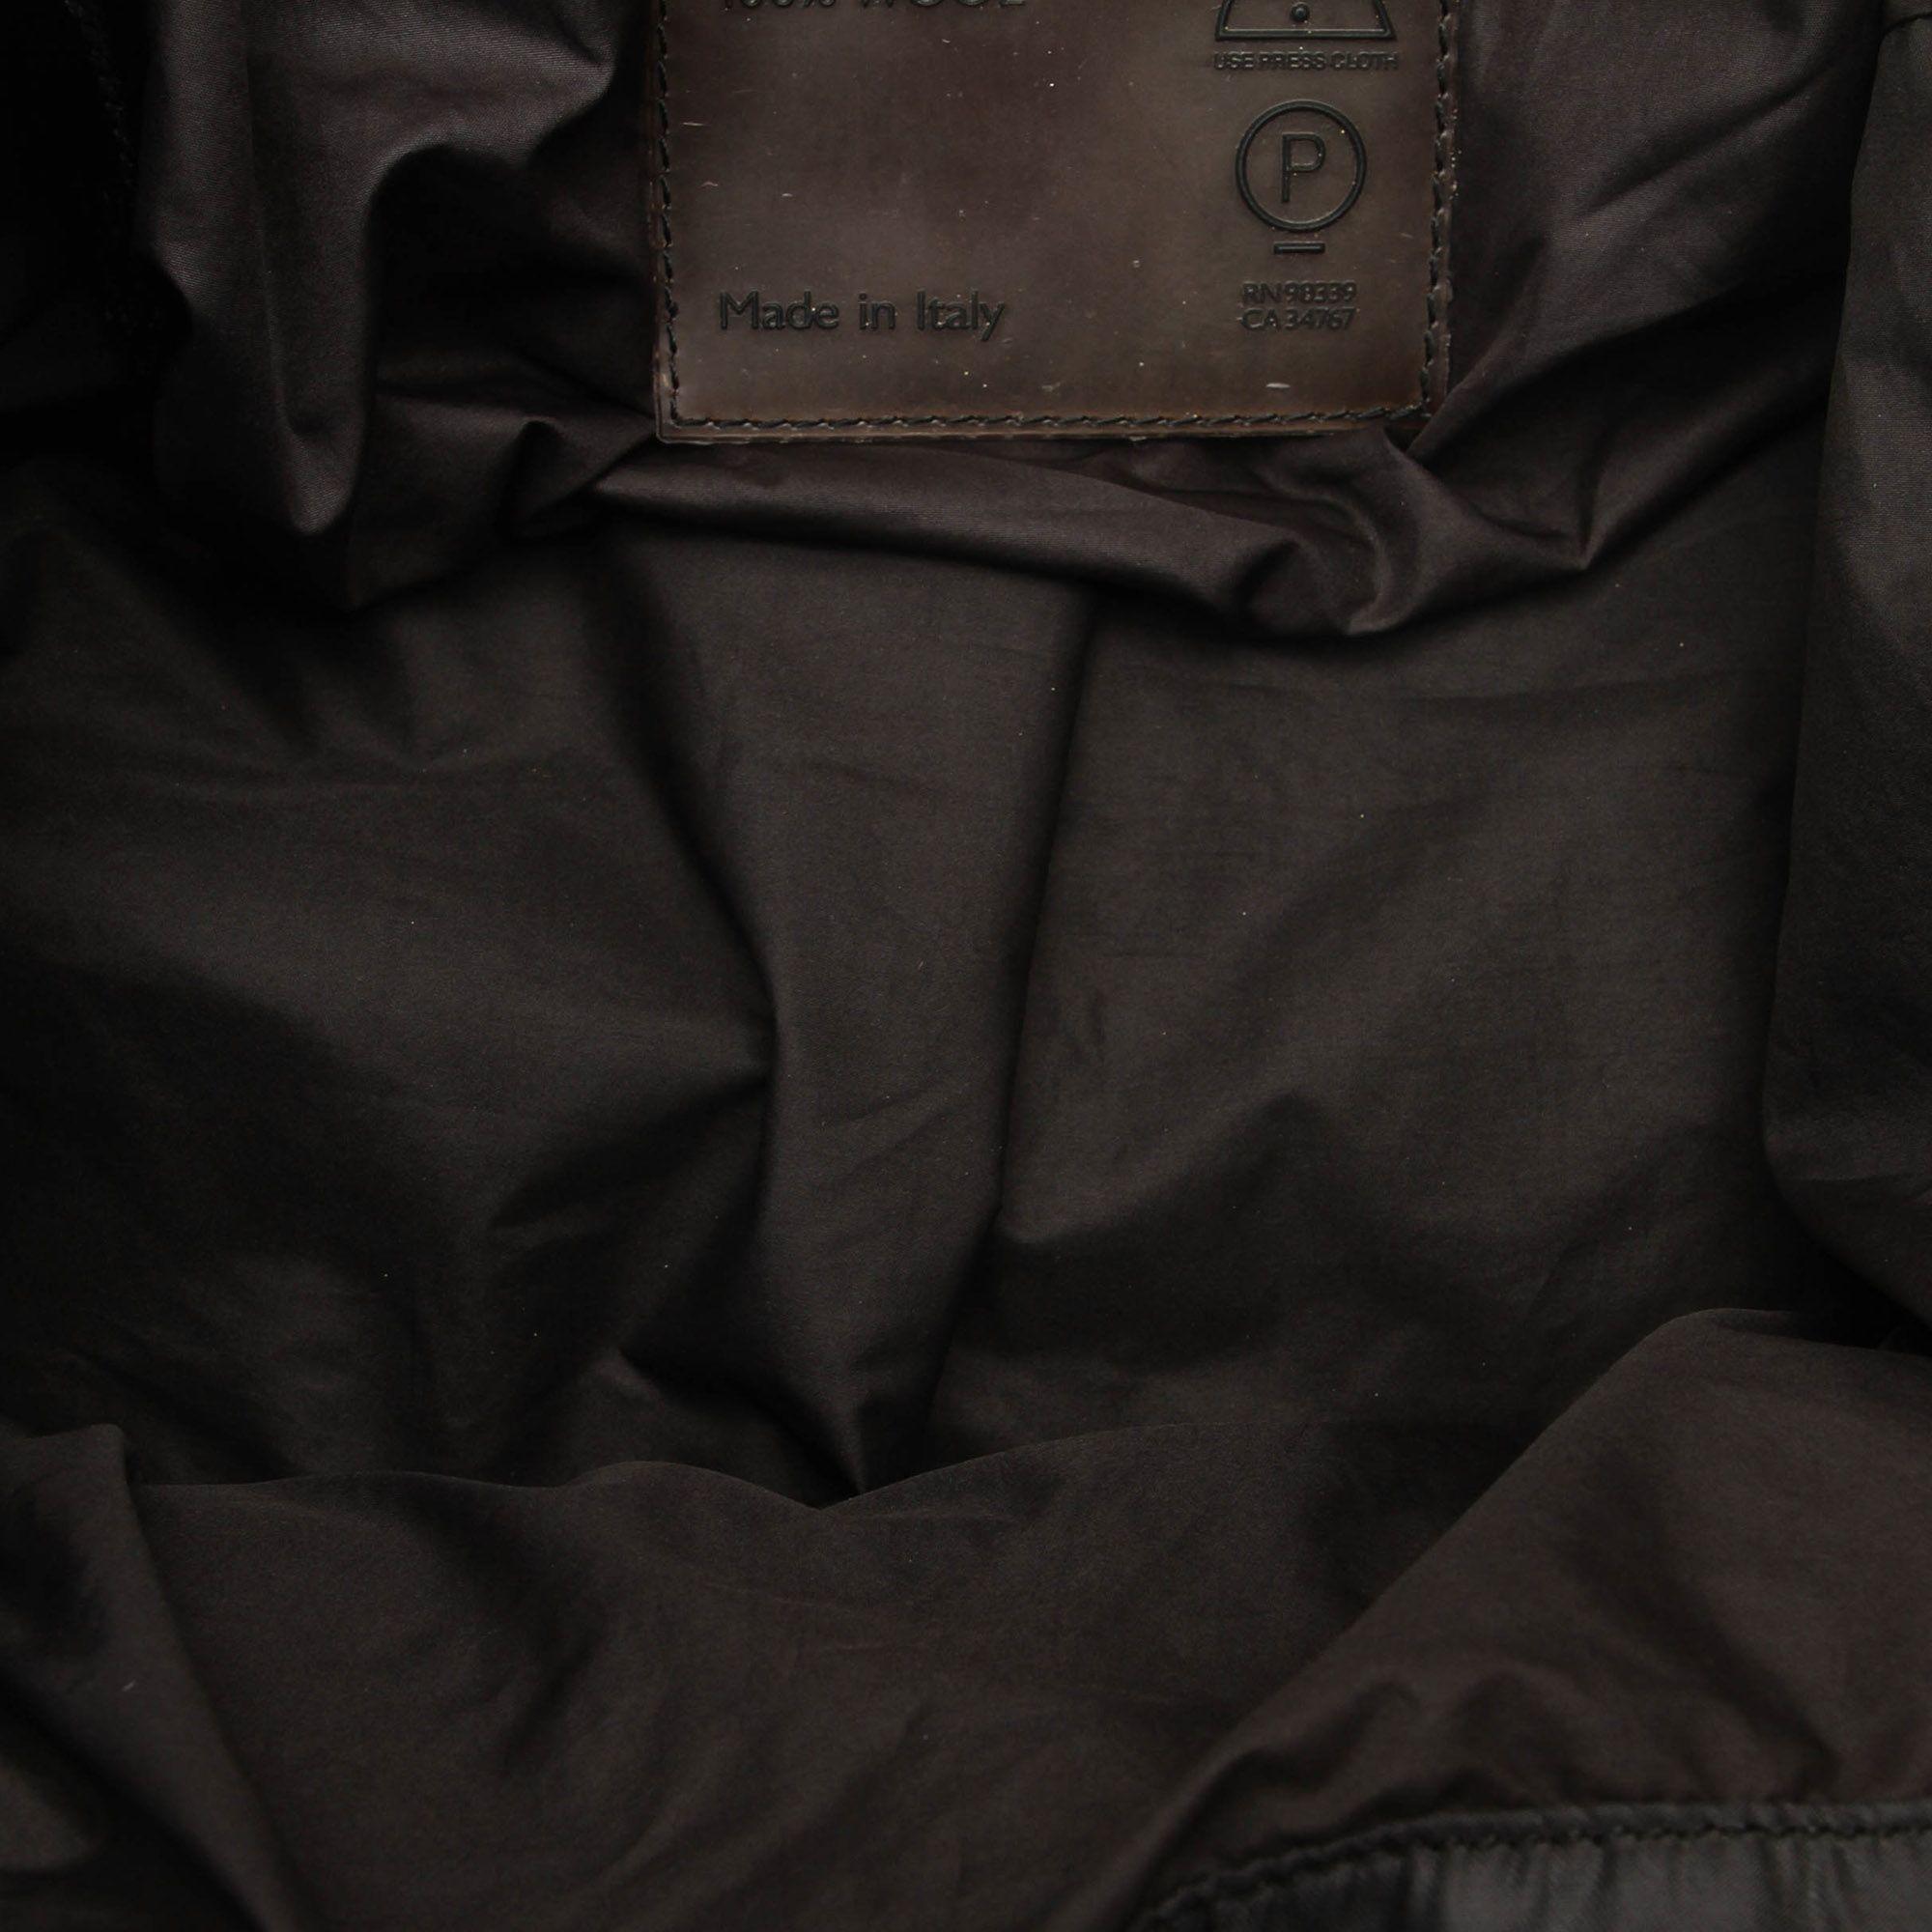 Vintage Prada Sports Nylon Travel Bag Black